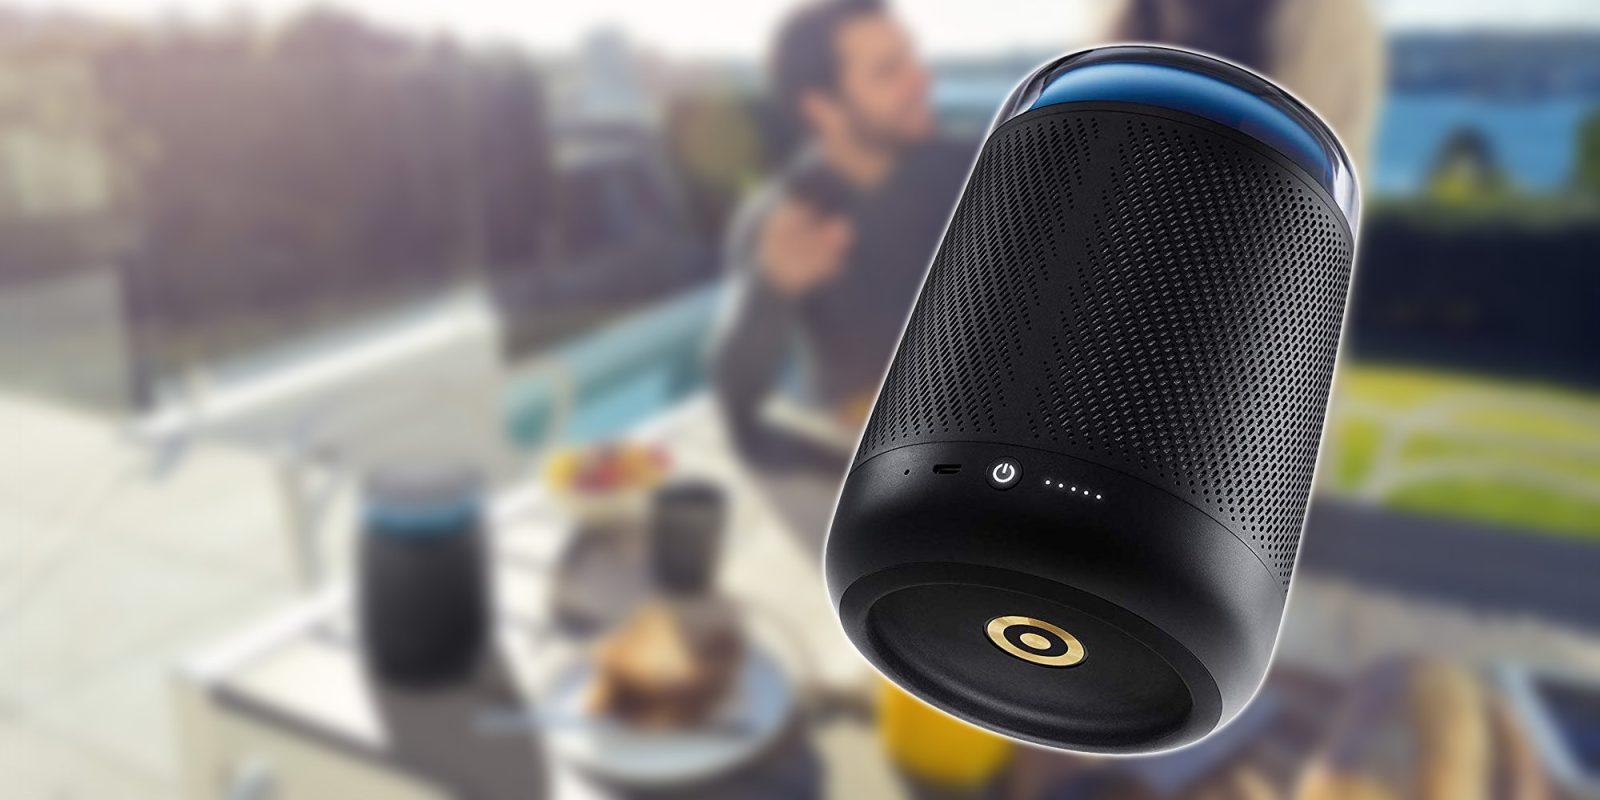 Amazon slashes 70% off Harman Kardon's dockable, hybrid smart speaker, now $65